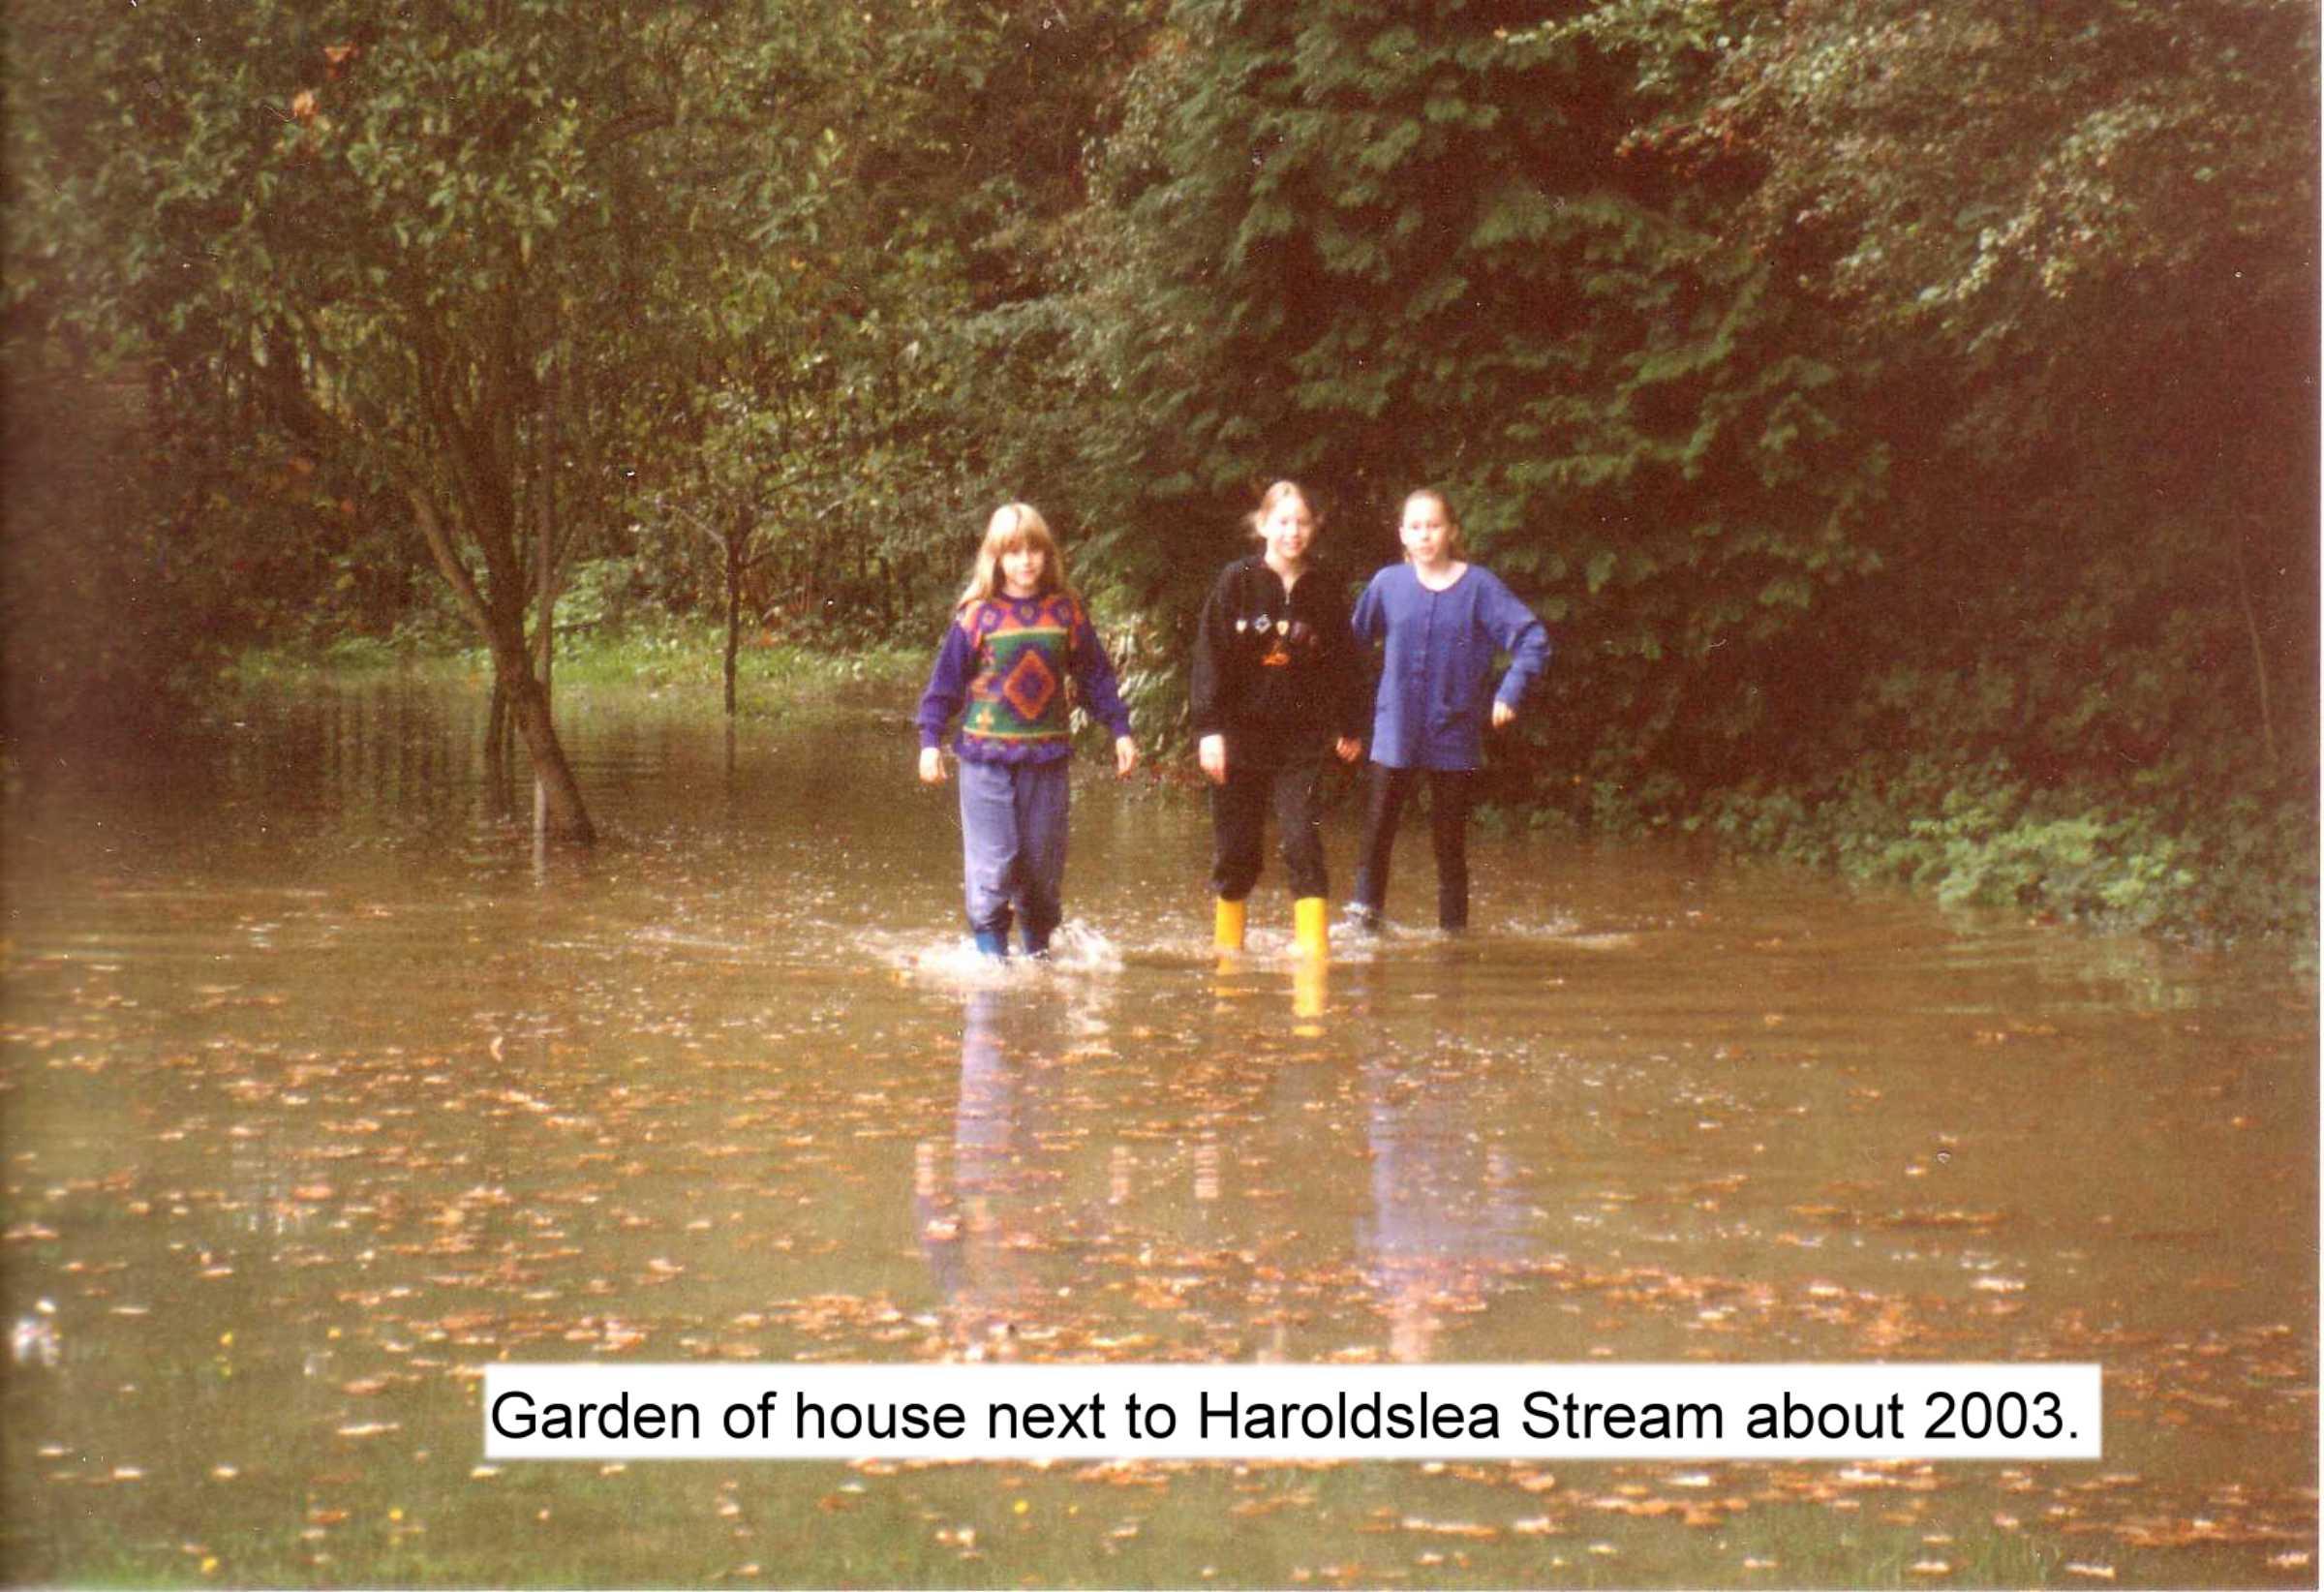 next to haroldslea stream c2003